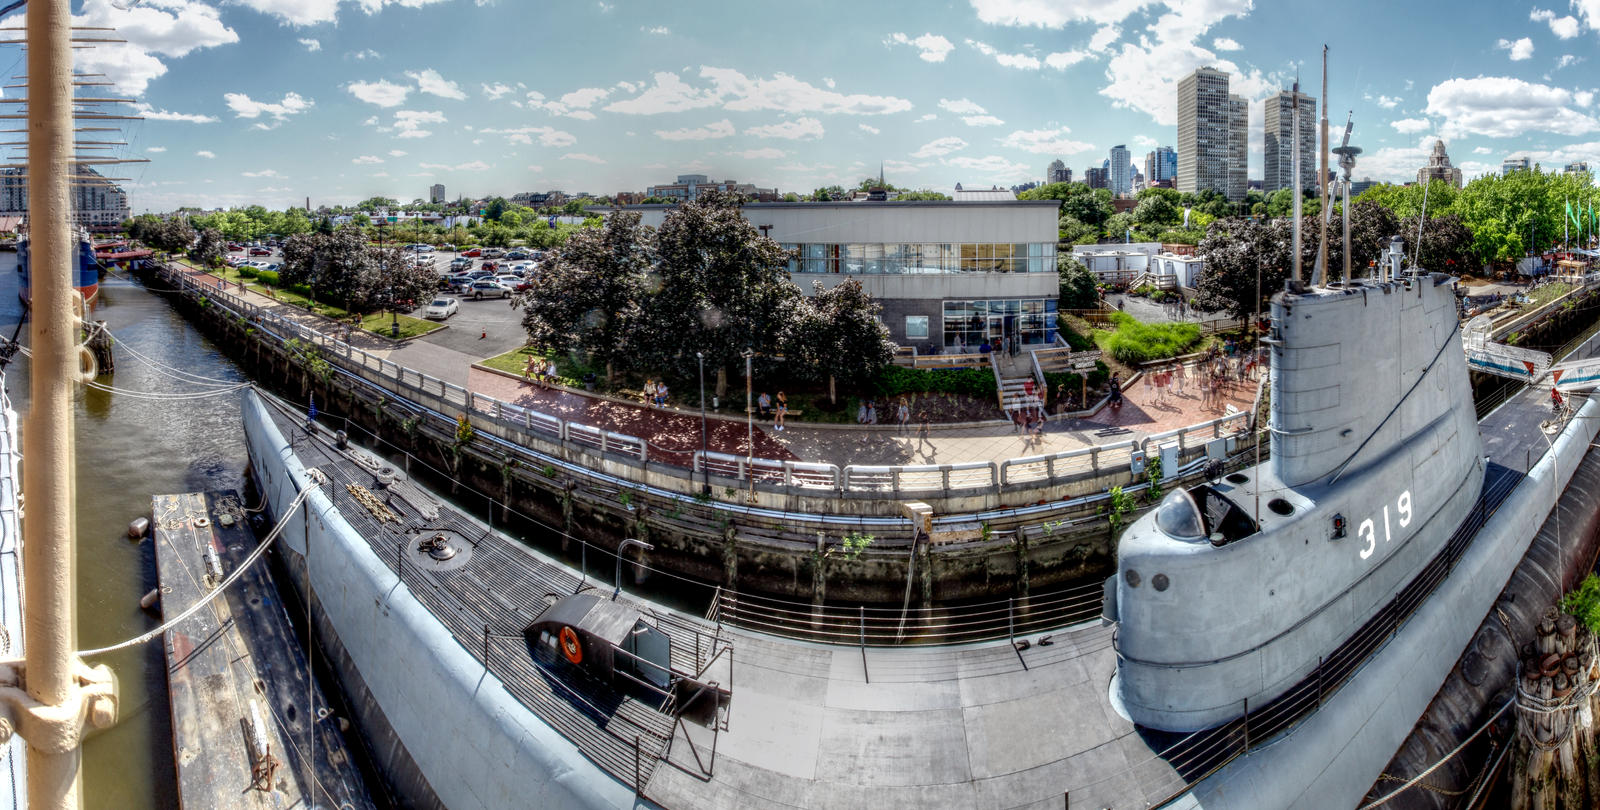 Panorama 3401 blended fused pregamma 1 mantiuk06 c